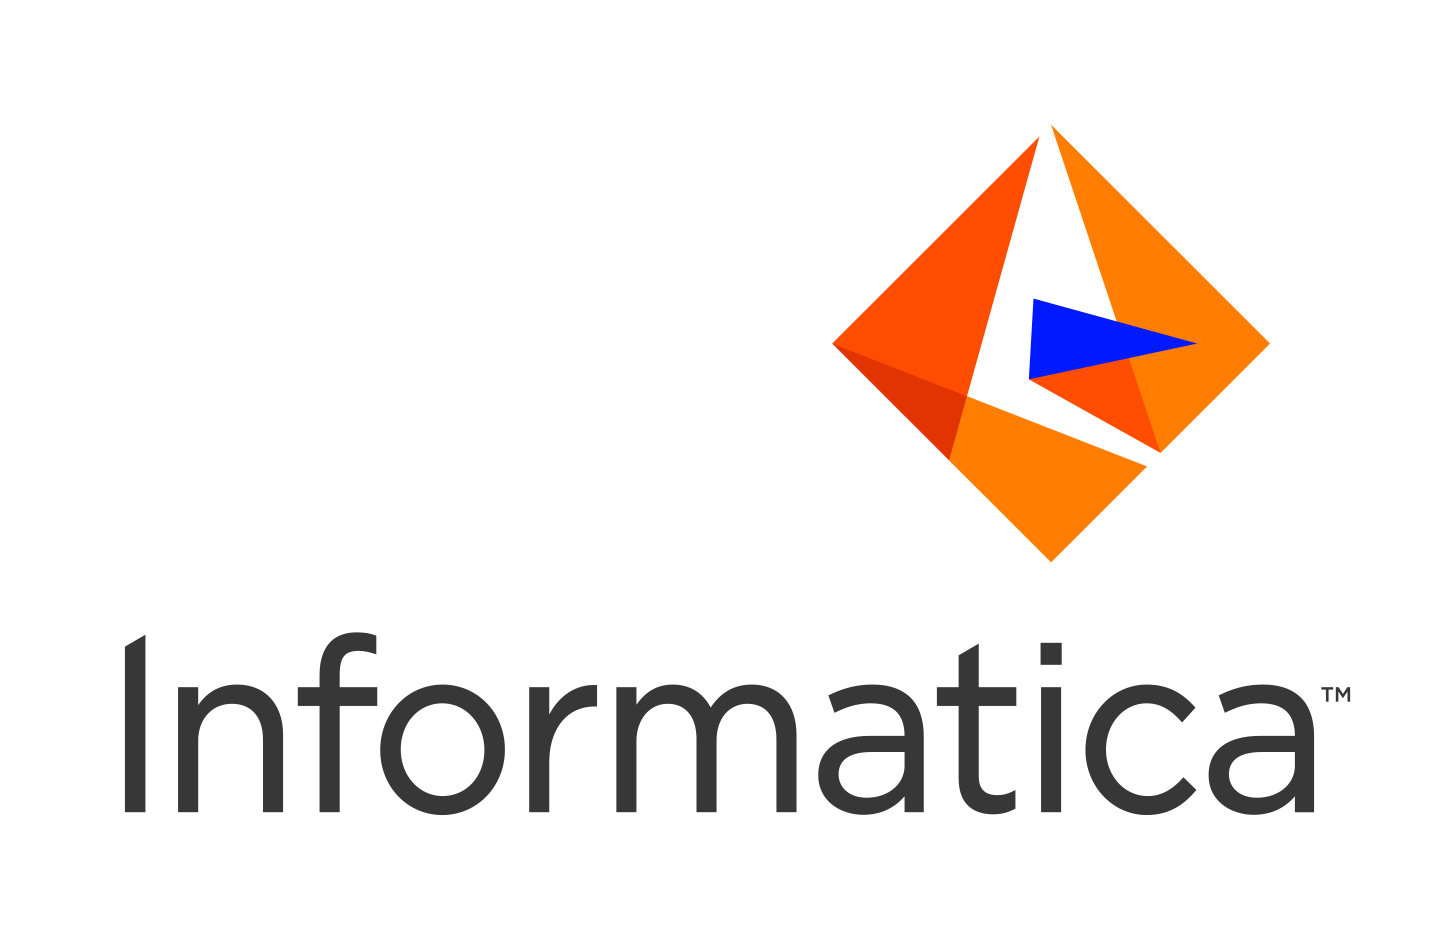 Informatica Big Data logo